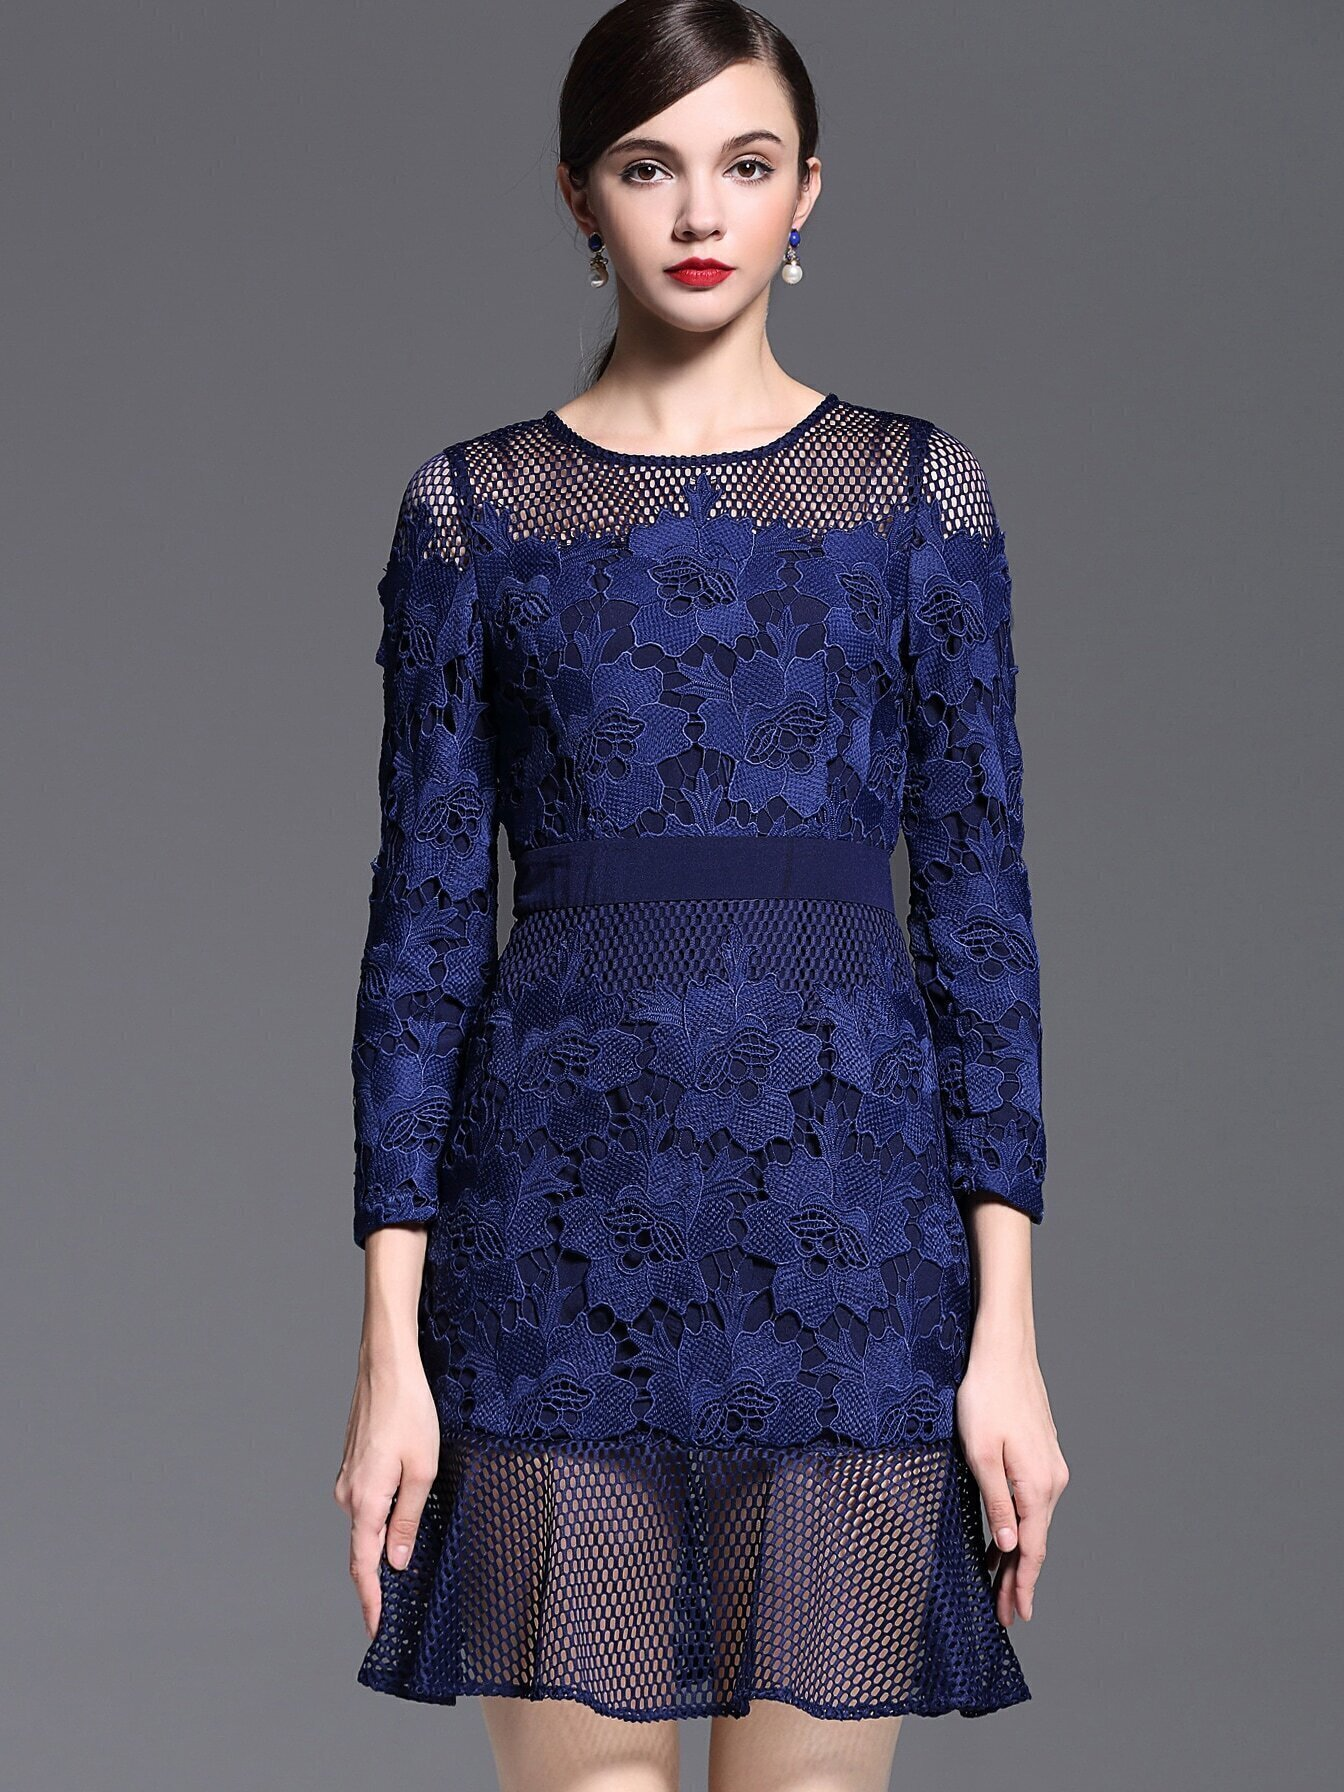 Blue Round Neck Long Sleeve Crochet Dress